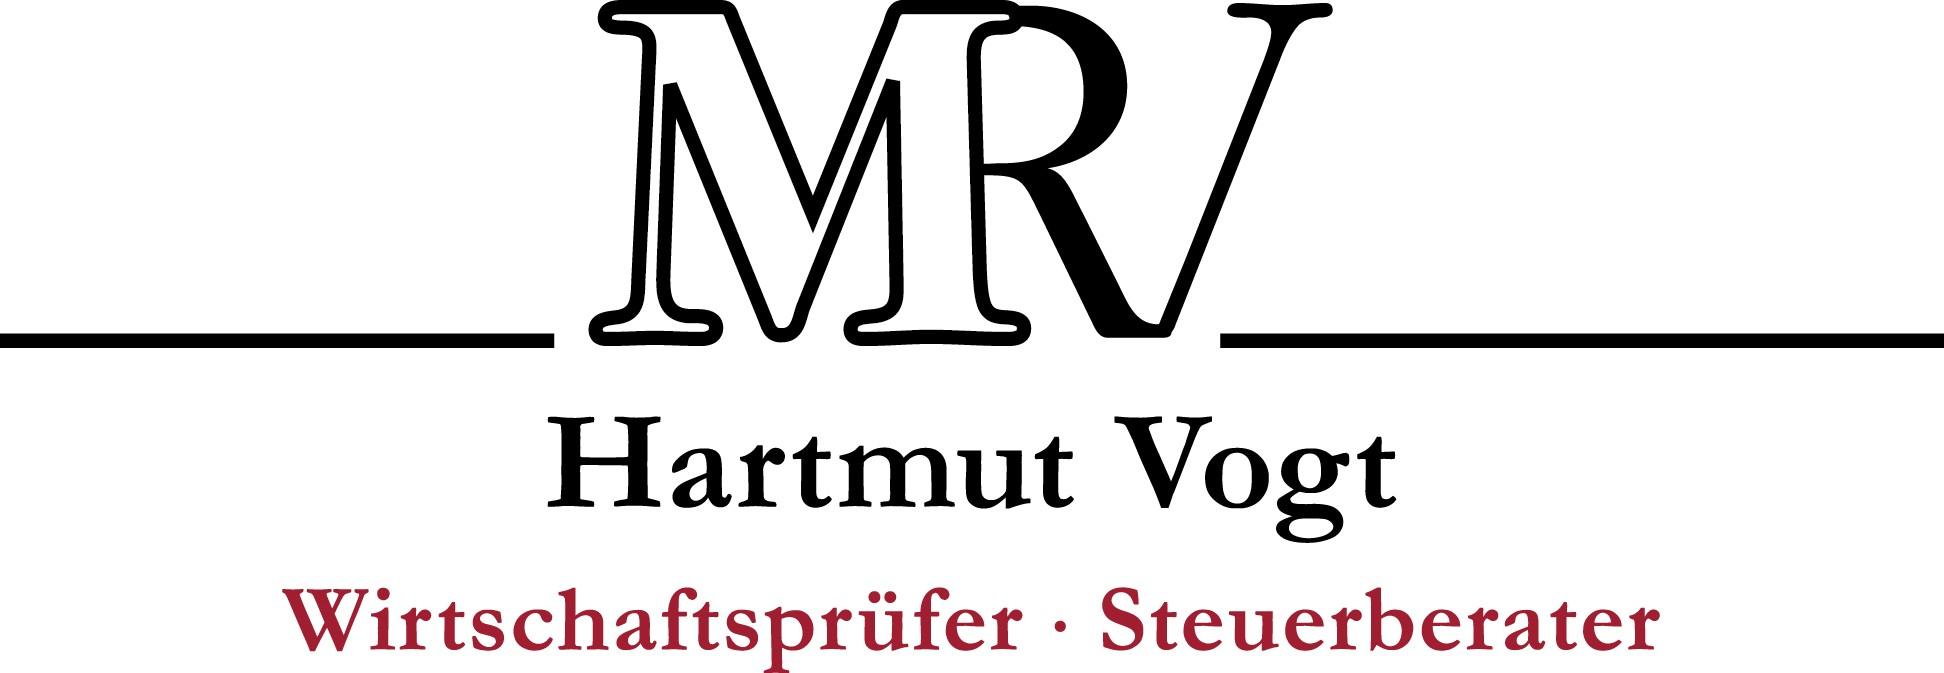 MMRV Hartmut Vogt